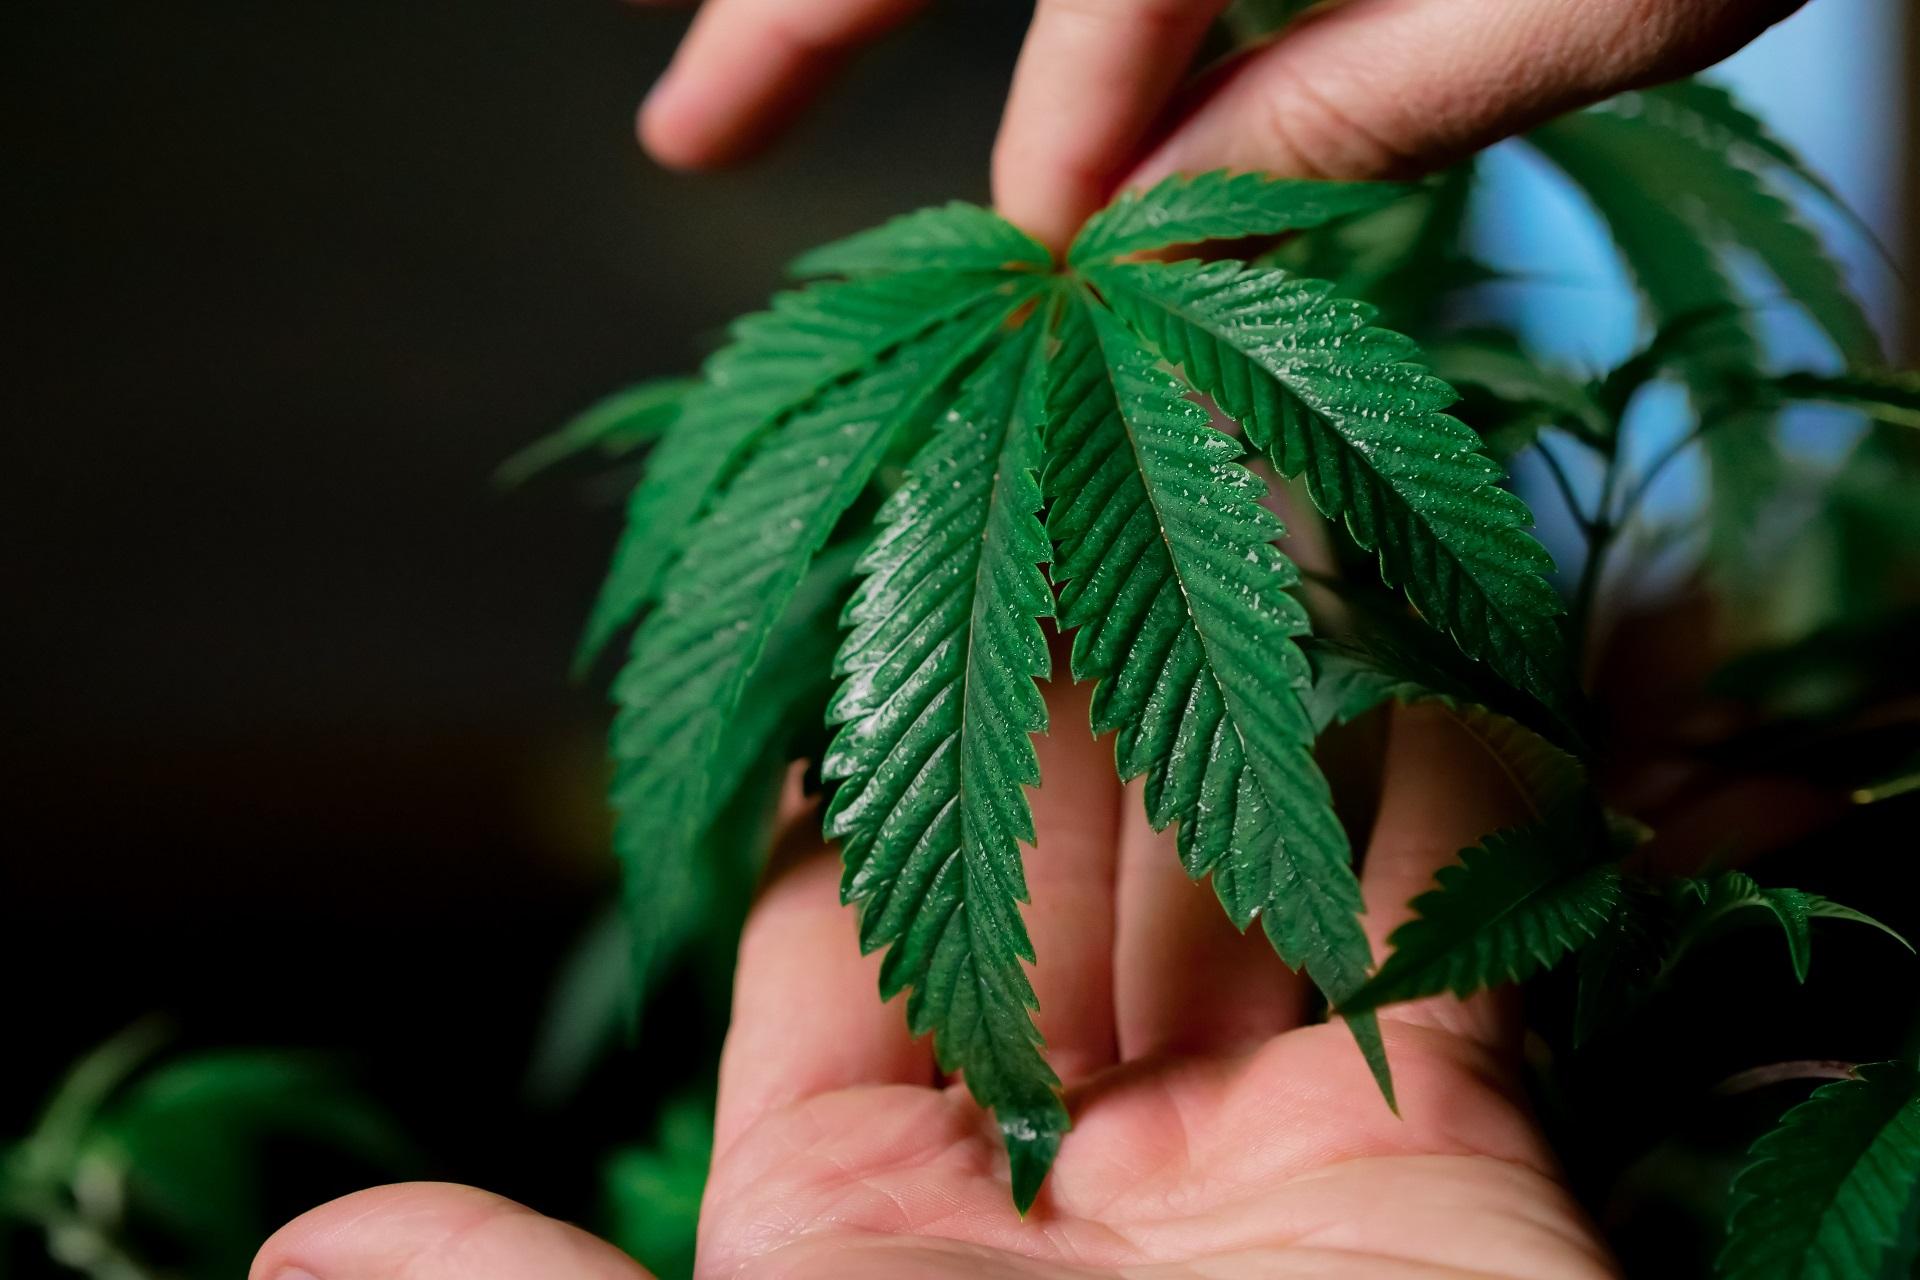 The Legitimacy of Medical Marijuana